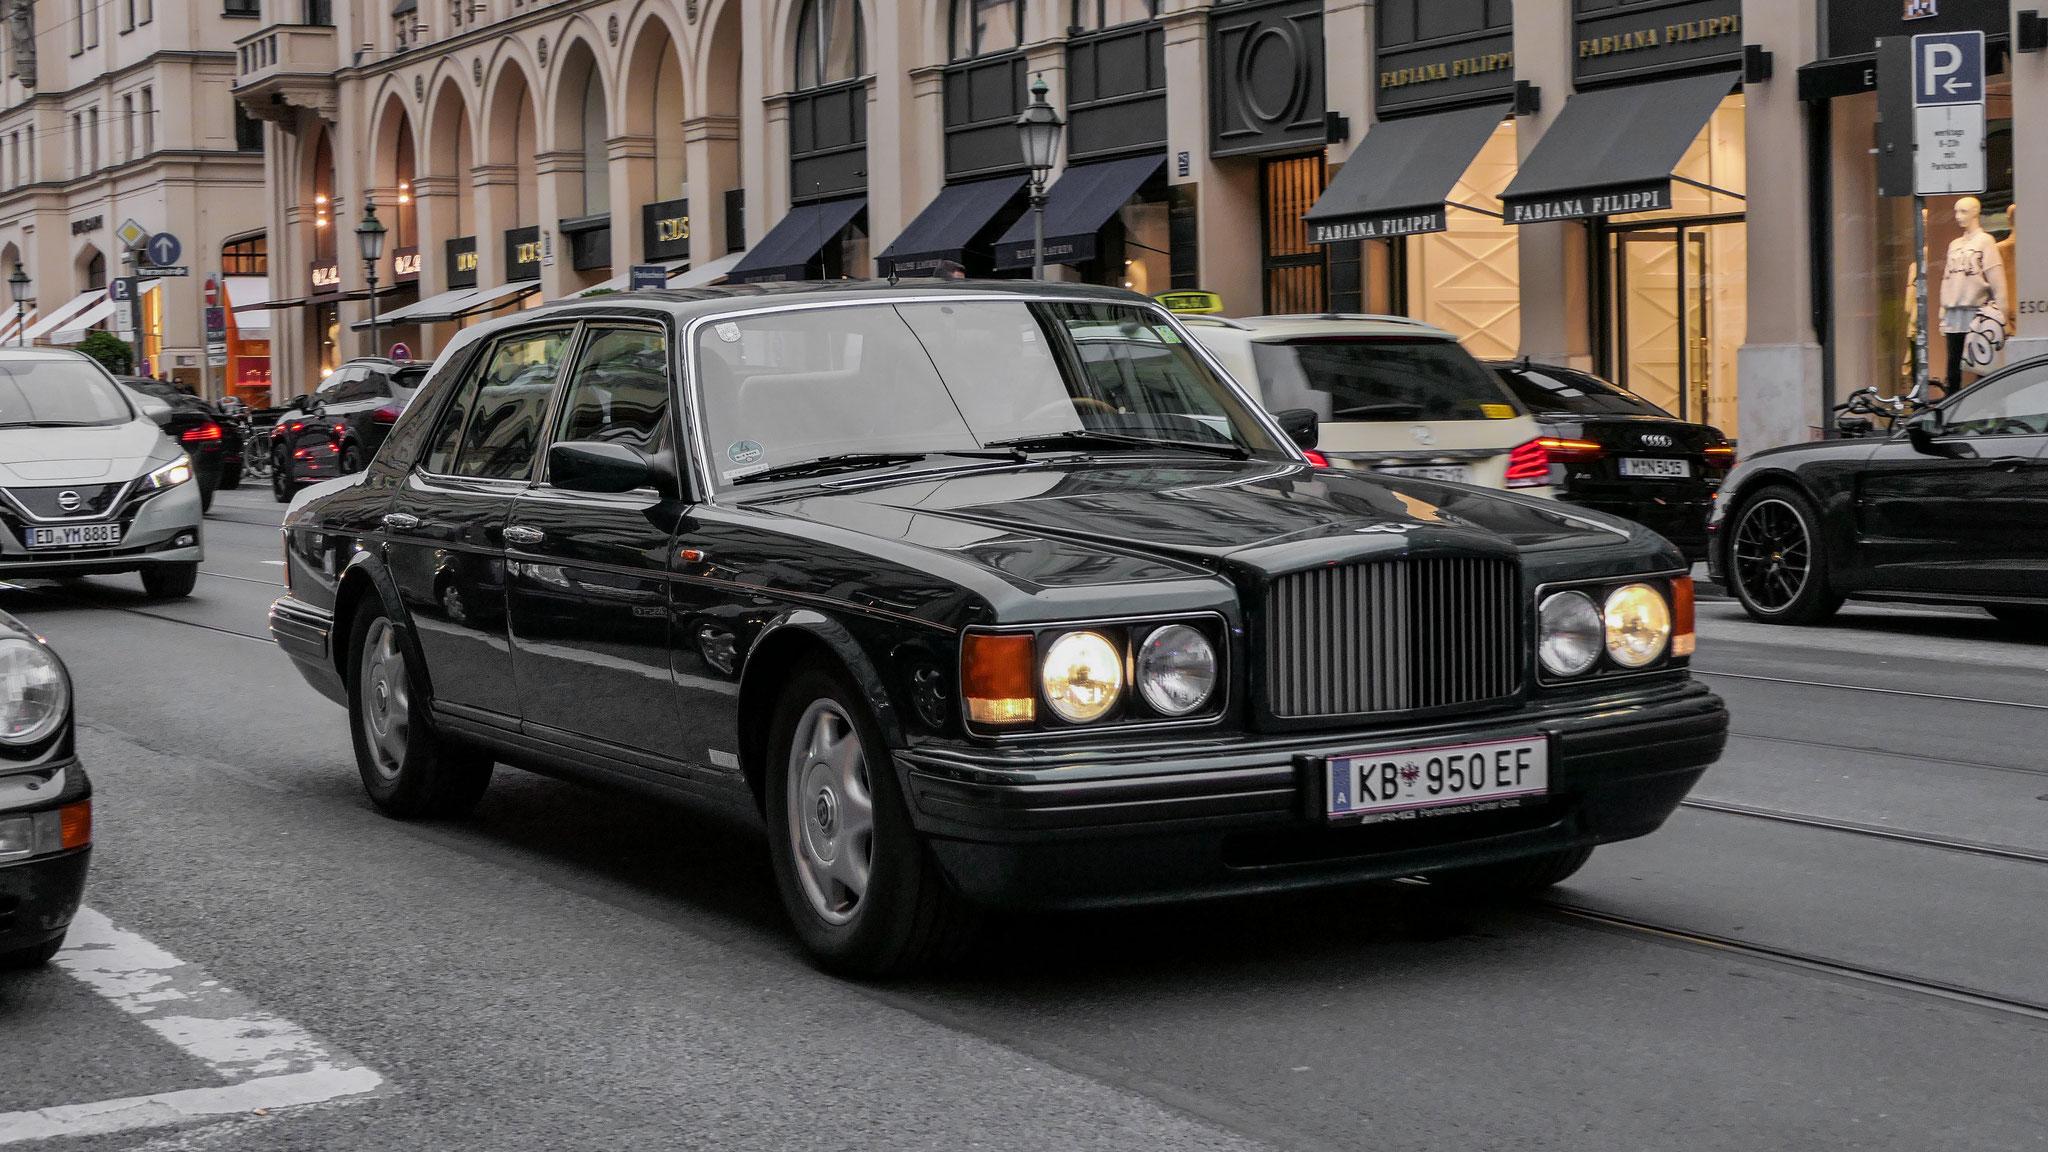 Bentley Mulsanne - KB-950-EF (AUT)